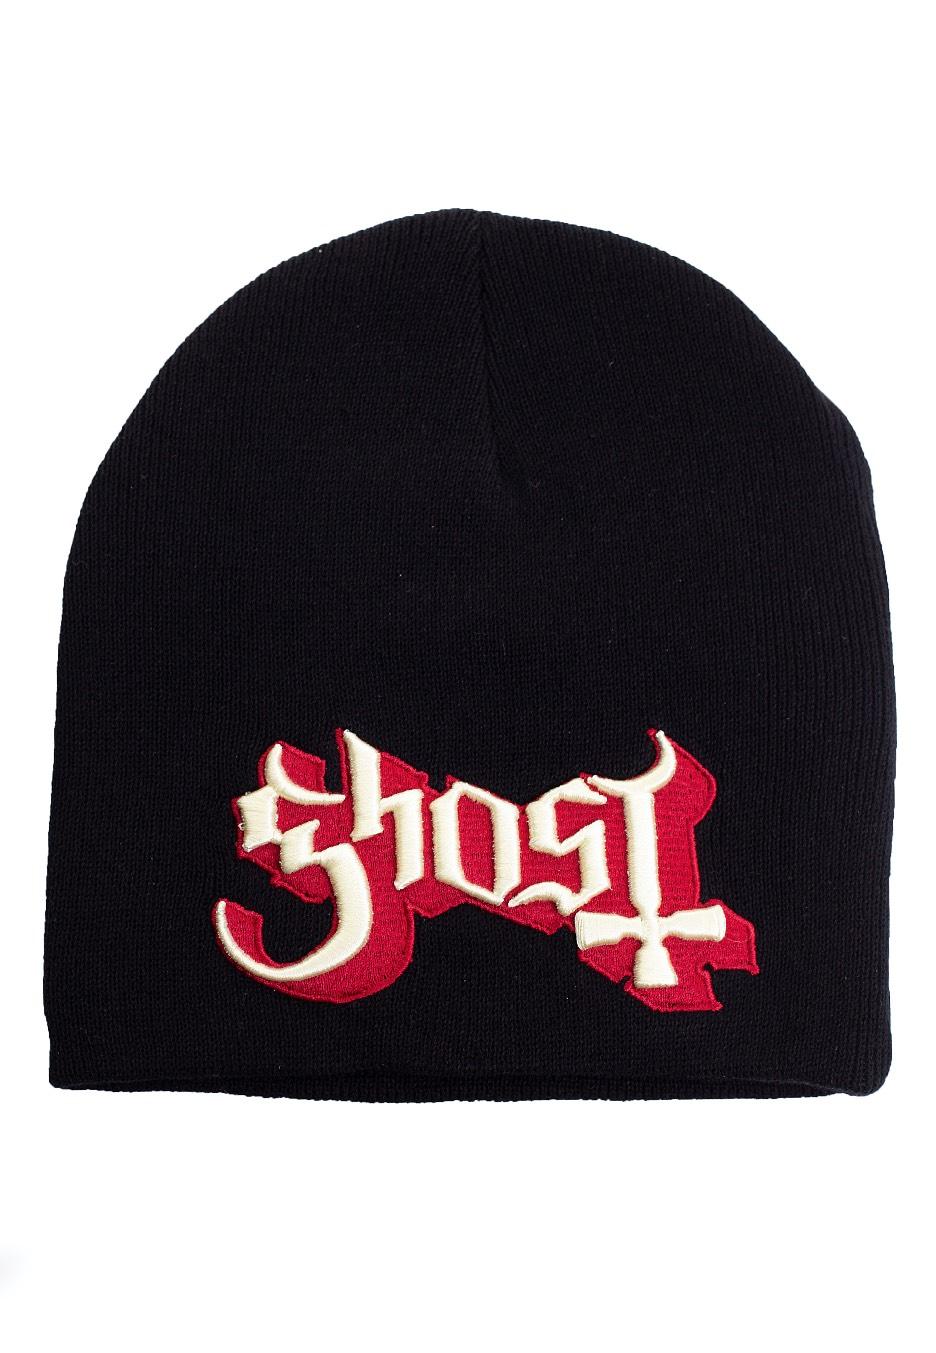 Ghost - Logo - Beanies